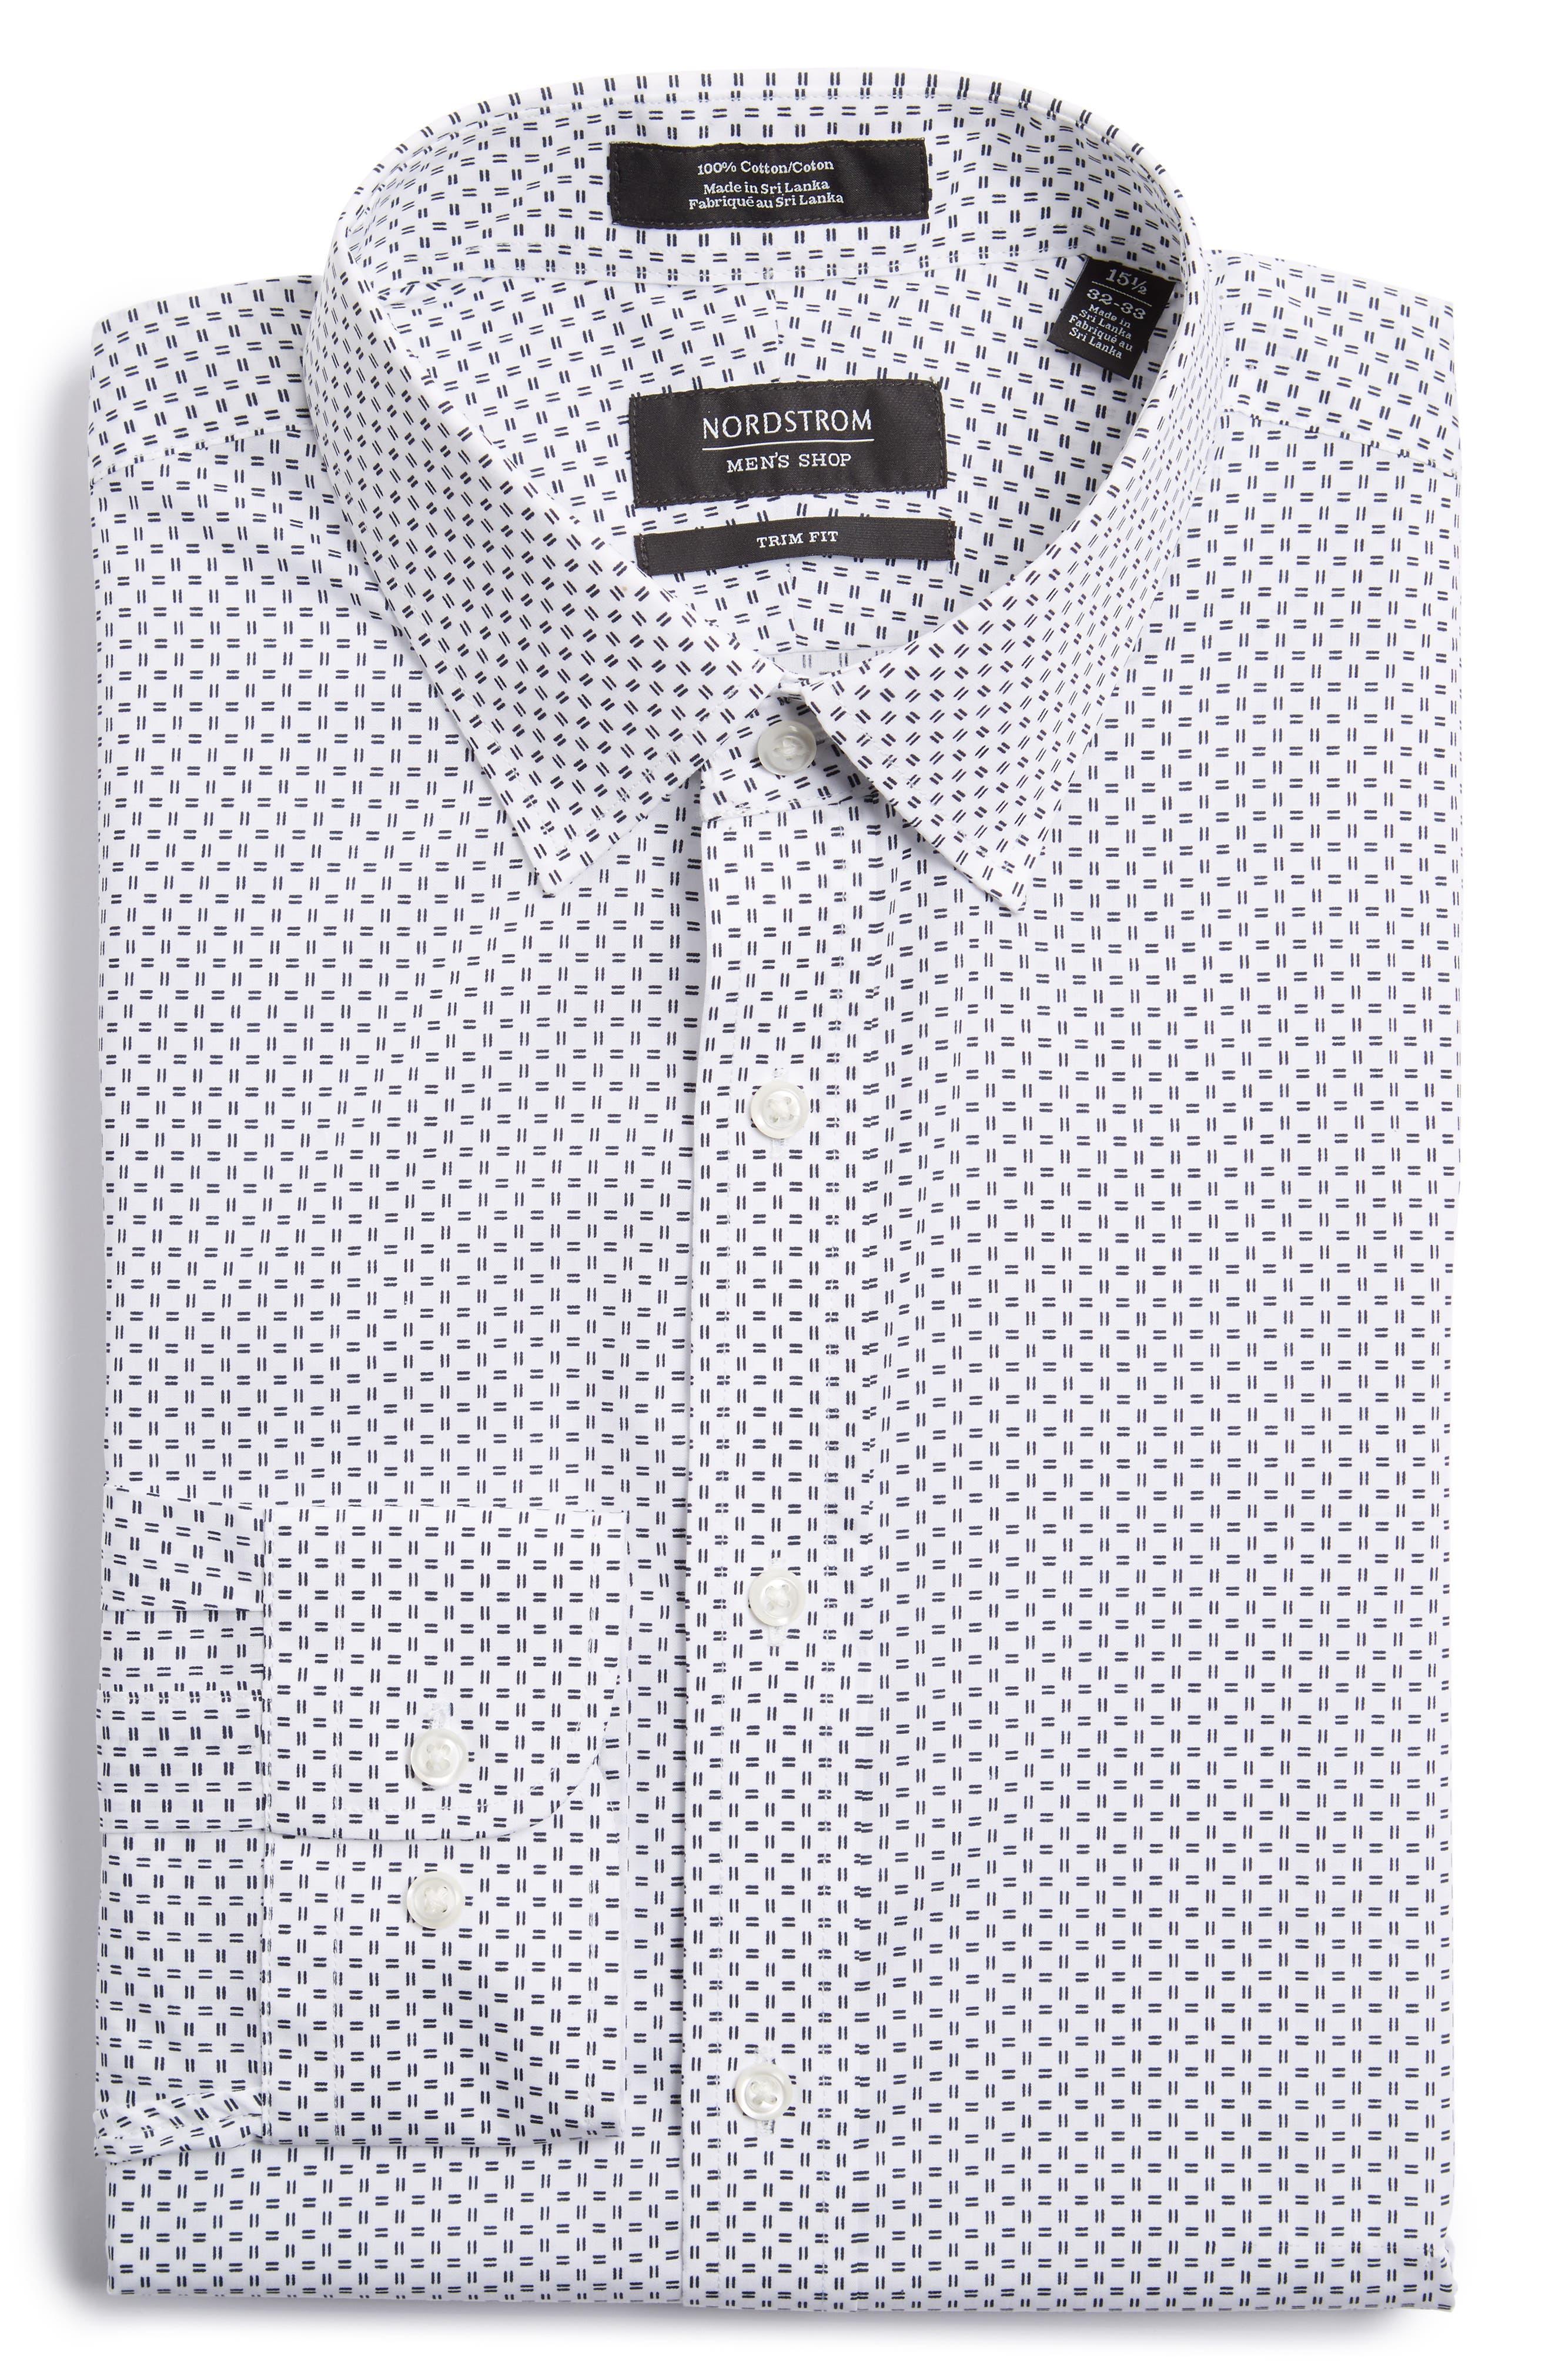 Alternate Image 1 Selected - Nordstrom Men's Shop Trim Fit Print Dress Shirt